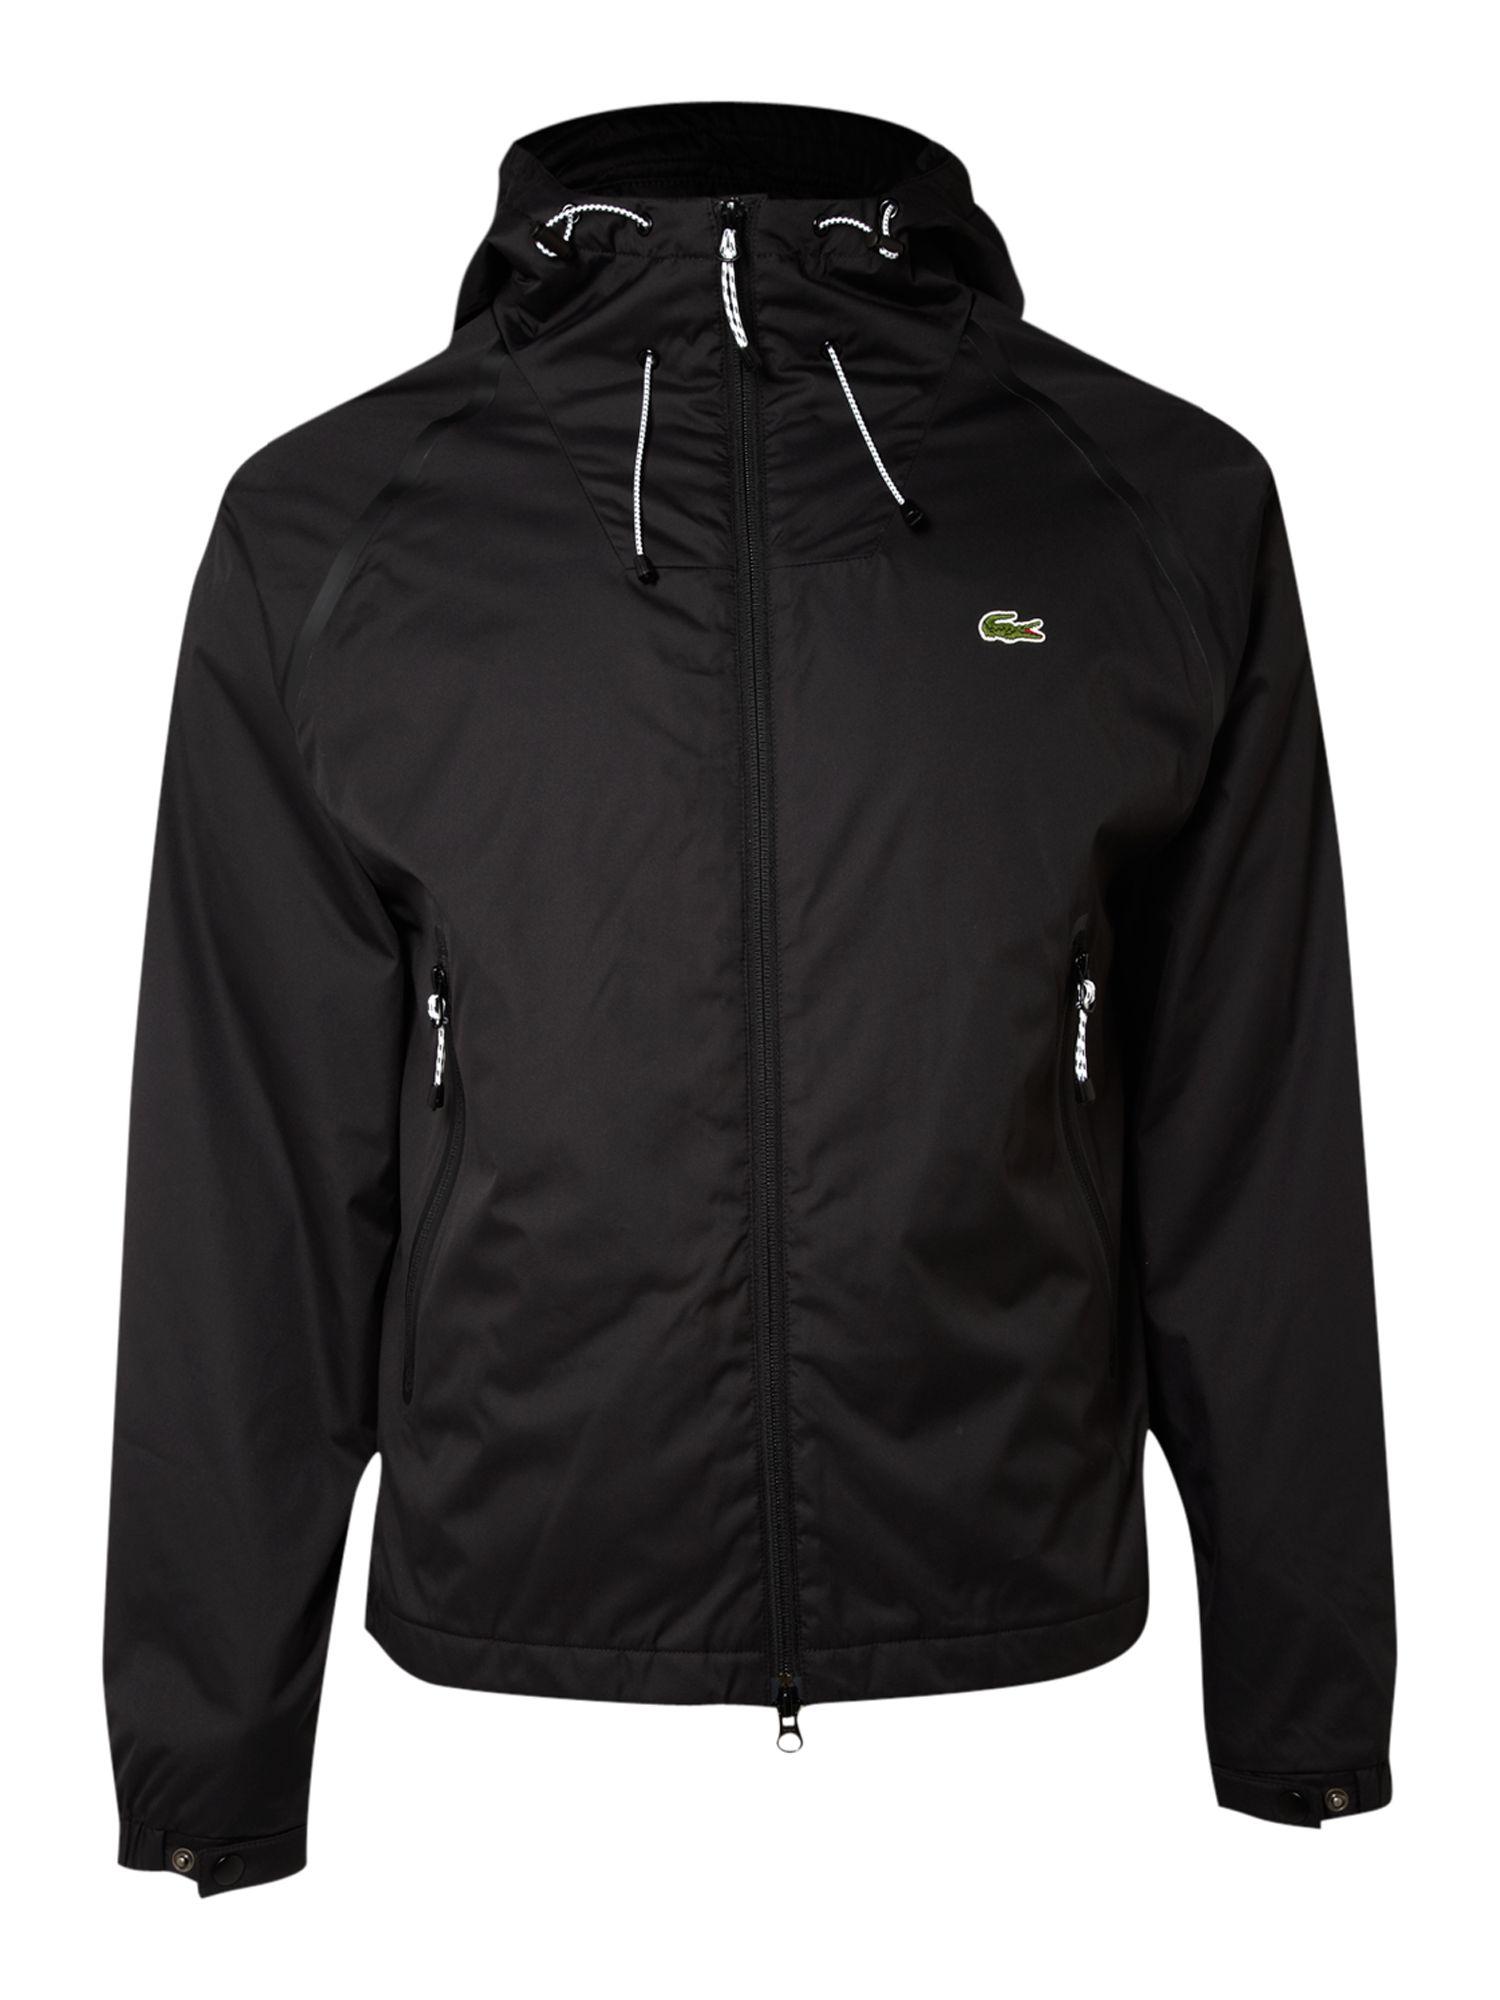 Lacoste Live Blouson Jacket In Black For Men Lyst